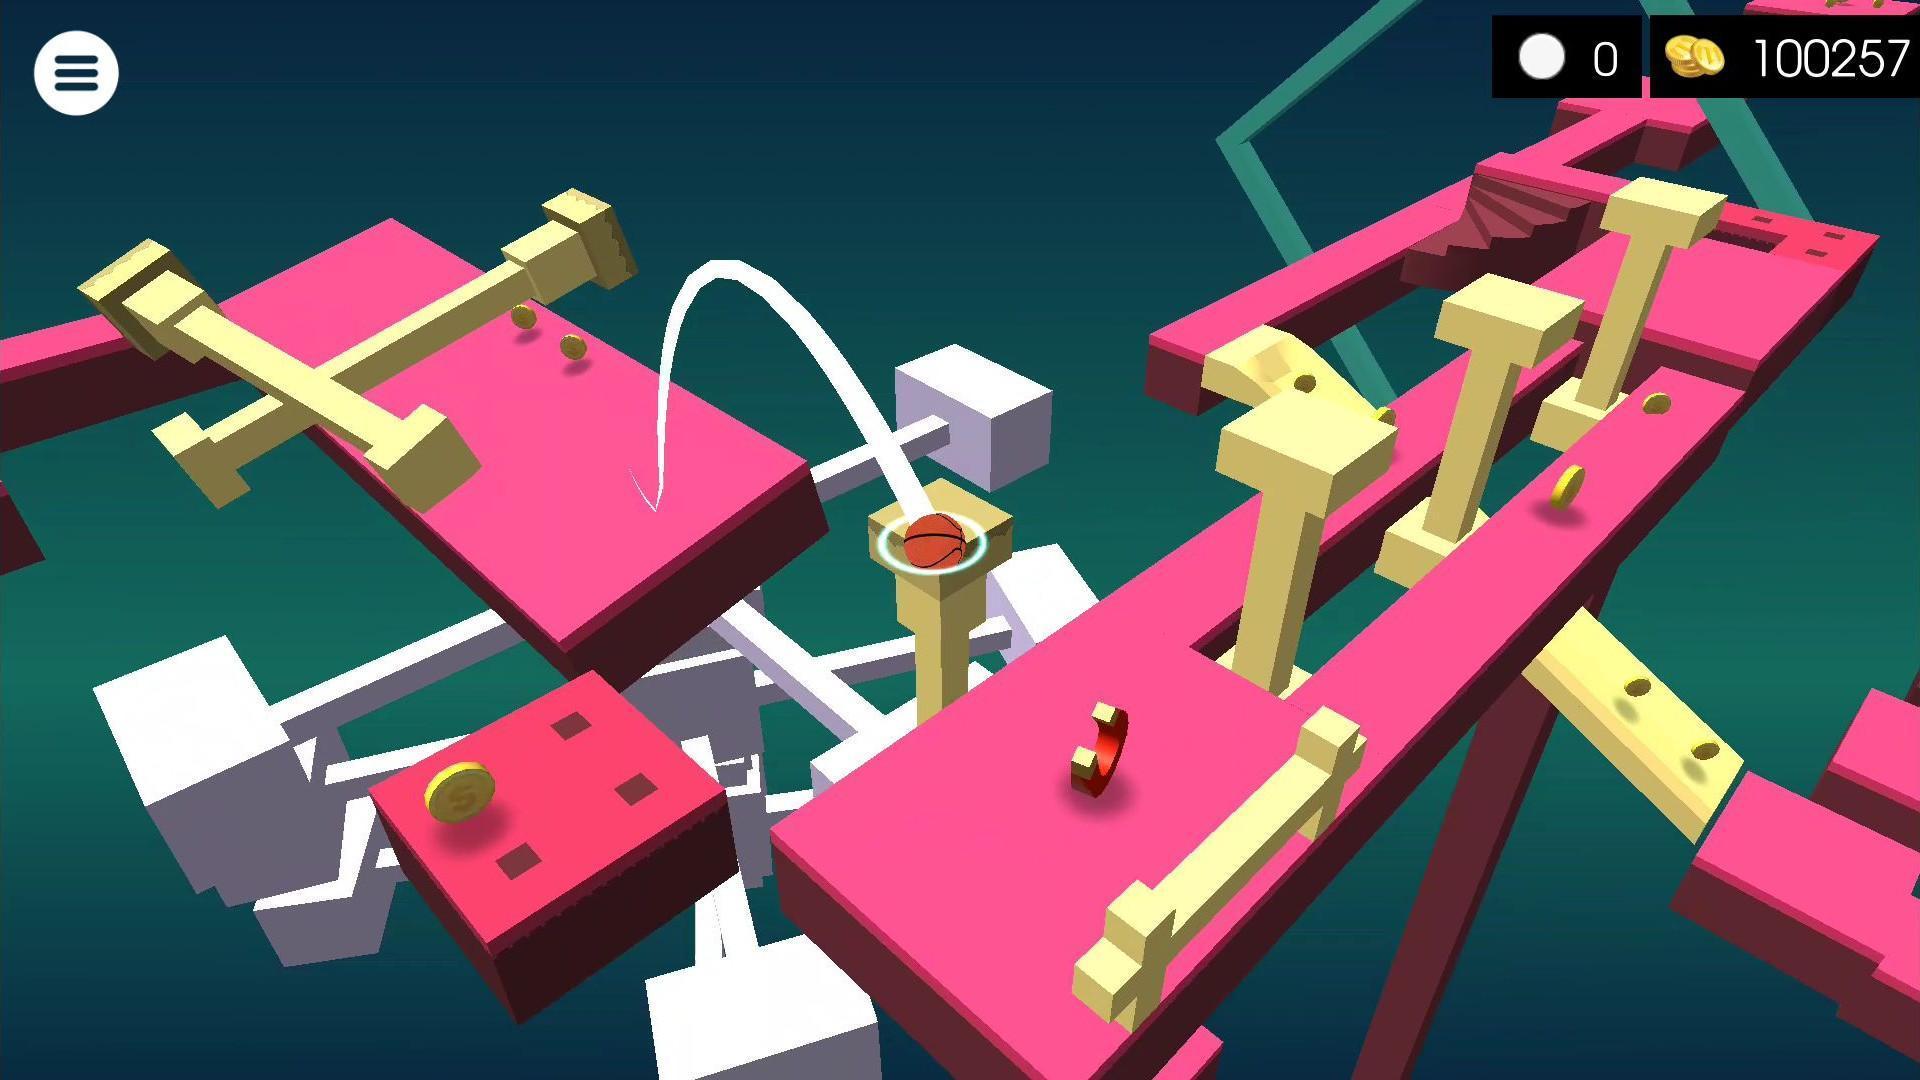 RYWO free 3D roll ball game 1.2.3 Screenshot 15